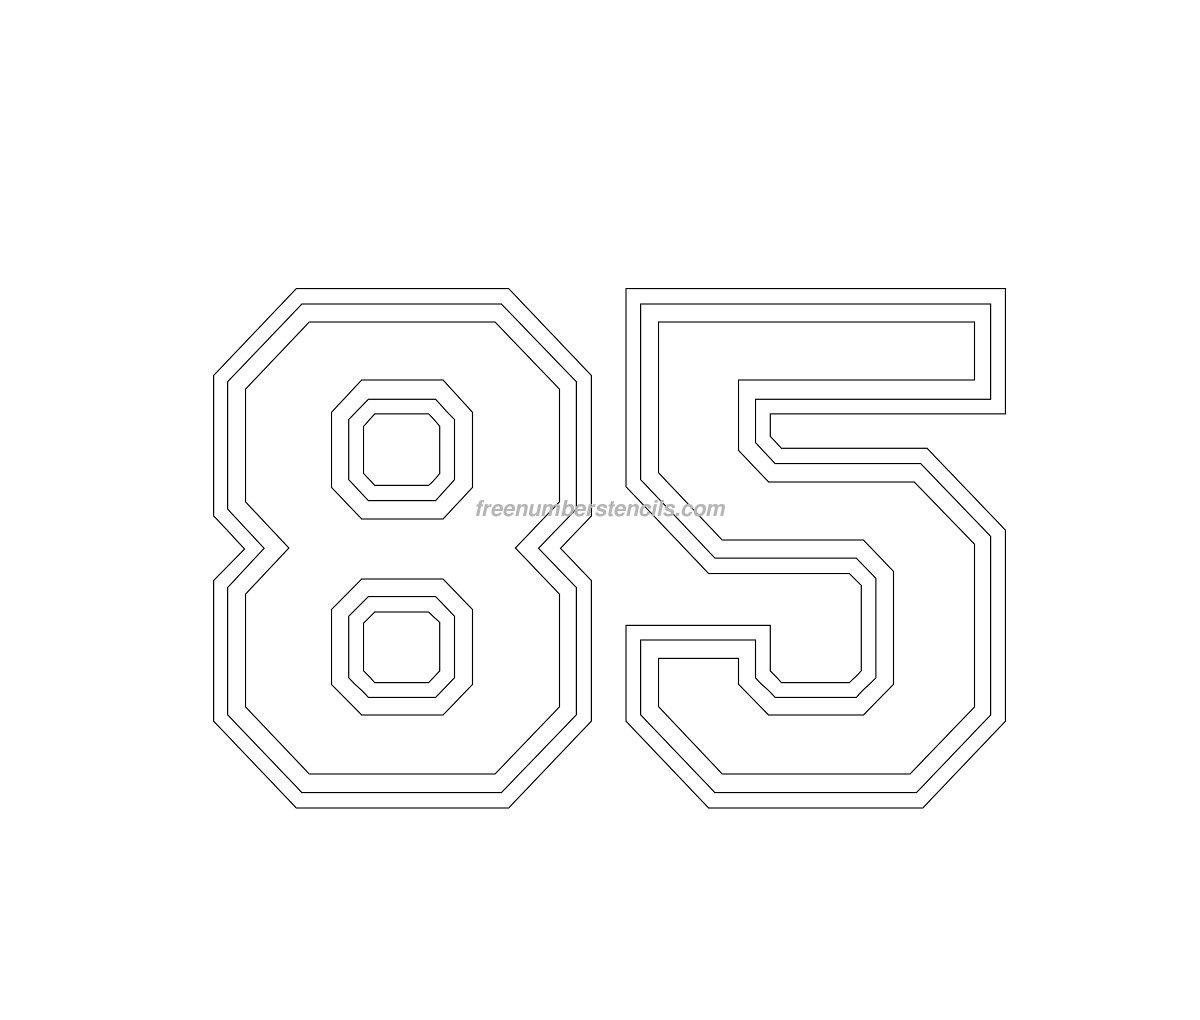 Free Varsity 85 Number Stencil - Freenumberstencils.com